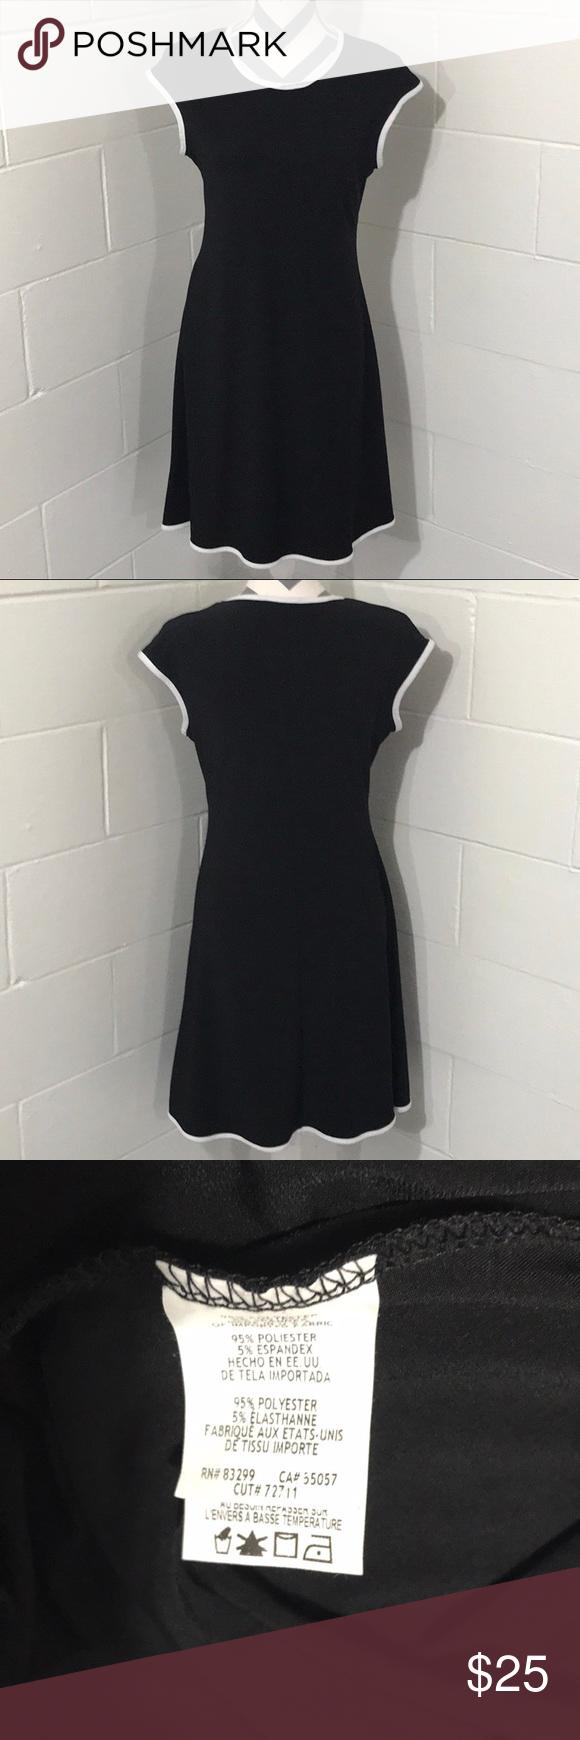 Annalee Hope Black Dress W White Trim Size M Black Dress Clothes Design Dresses [ 1740 x 580 Pixel ]